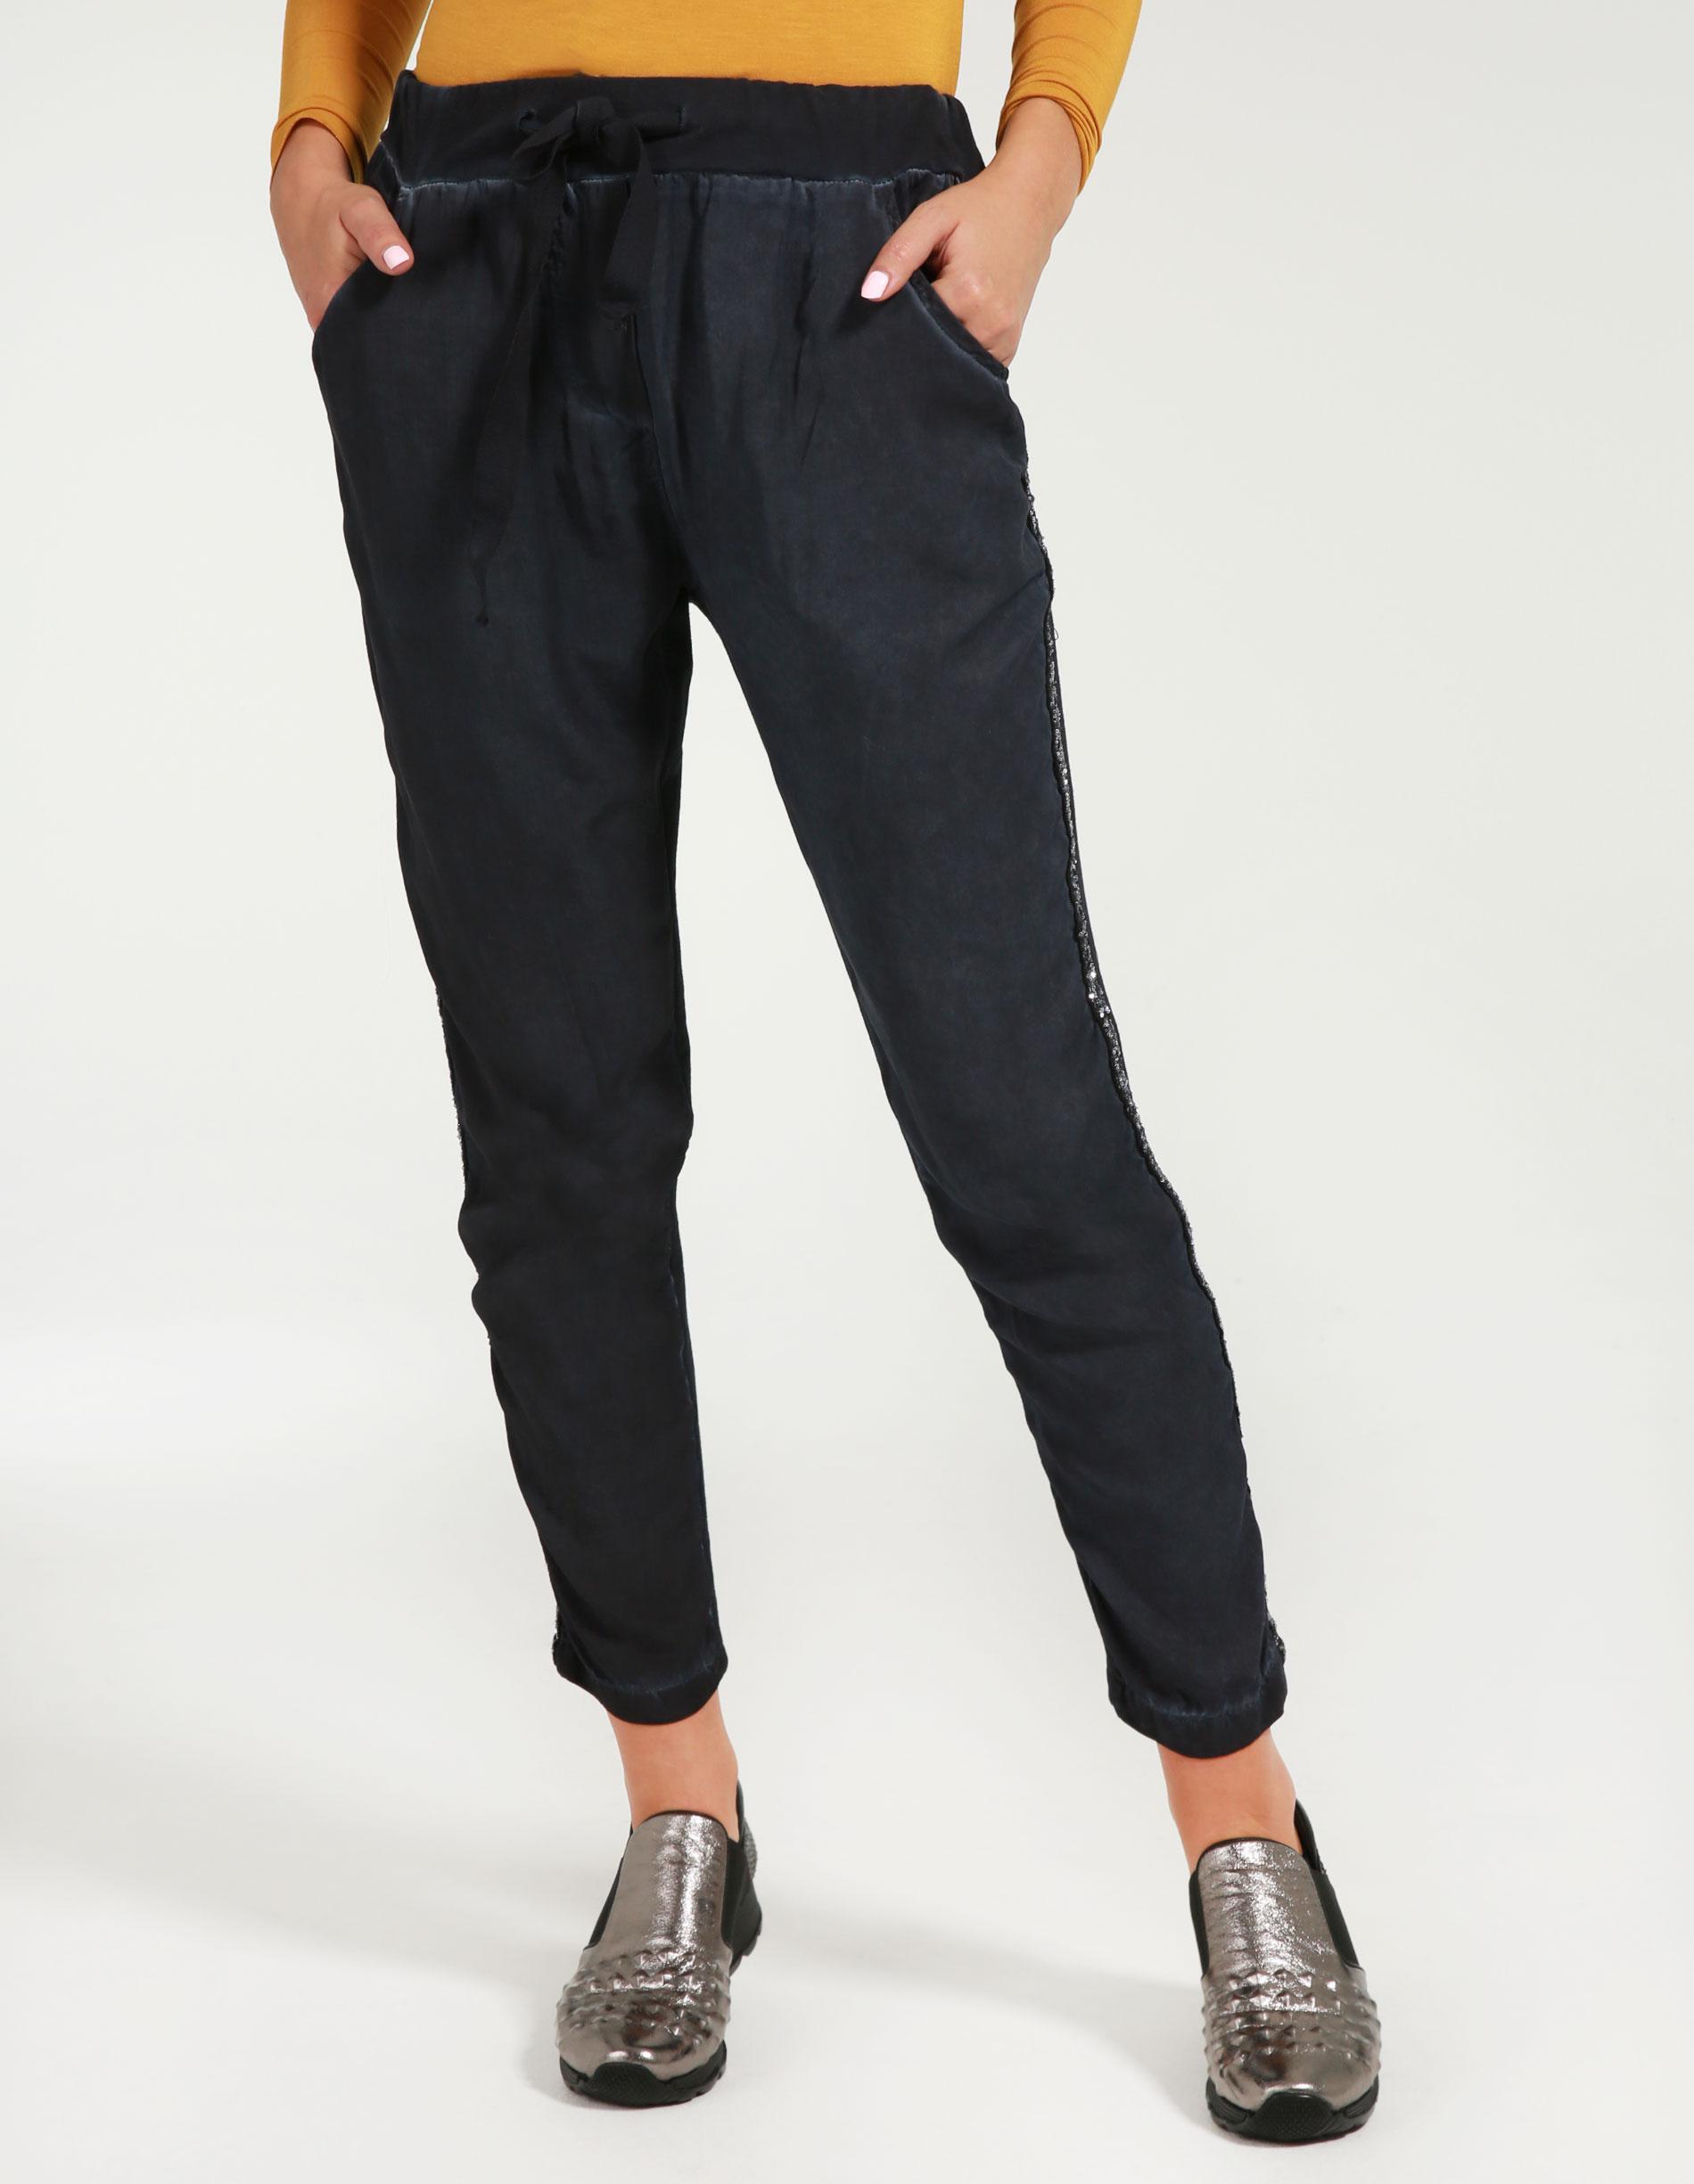 Spodnie - 137-32532 BLS - Unisono